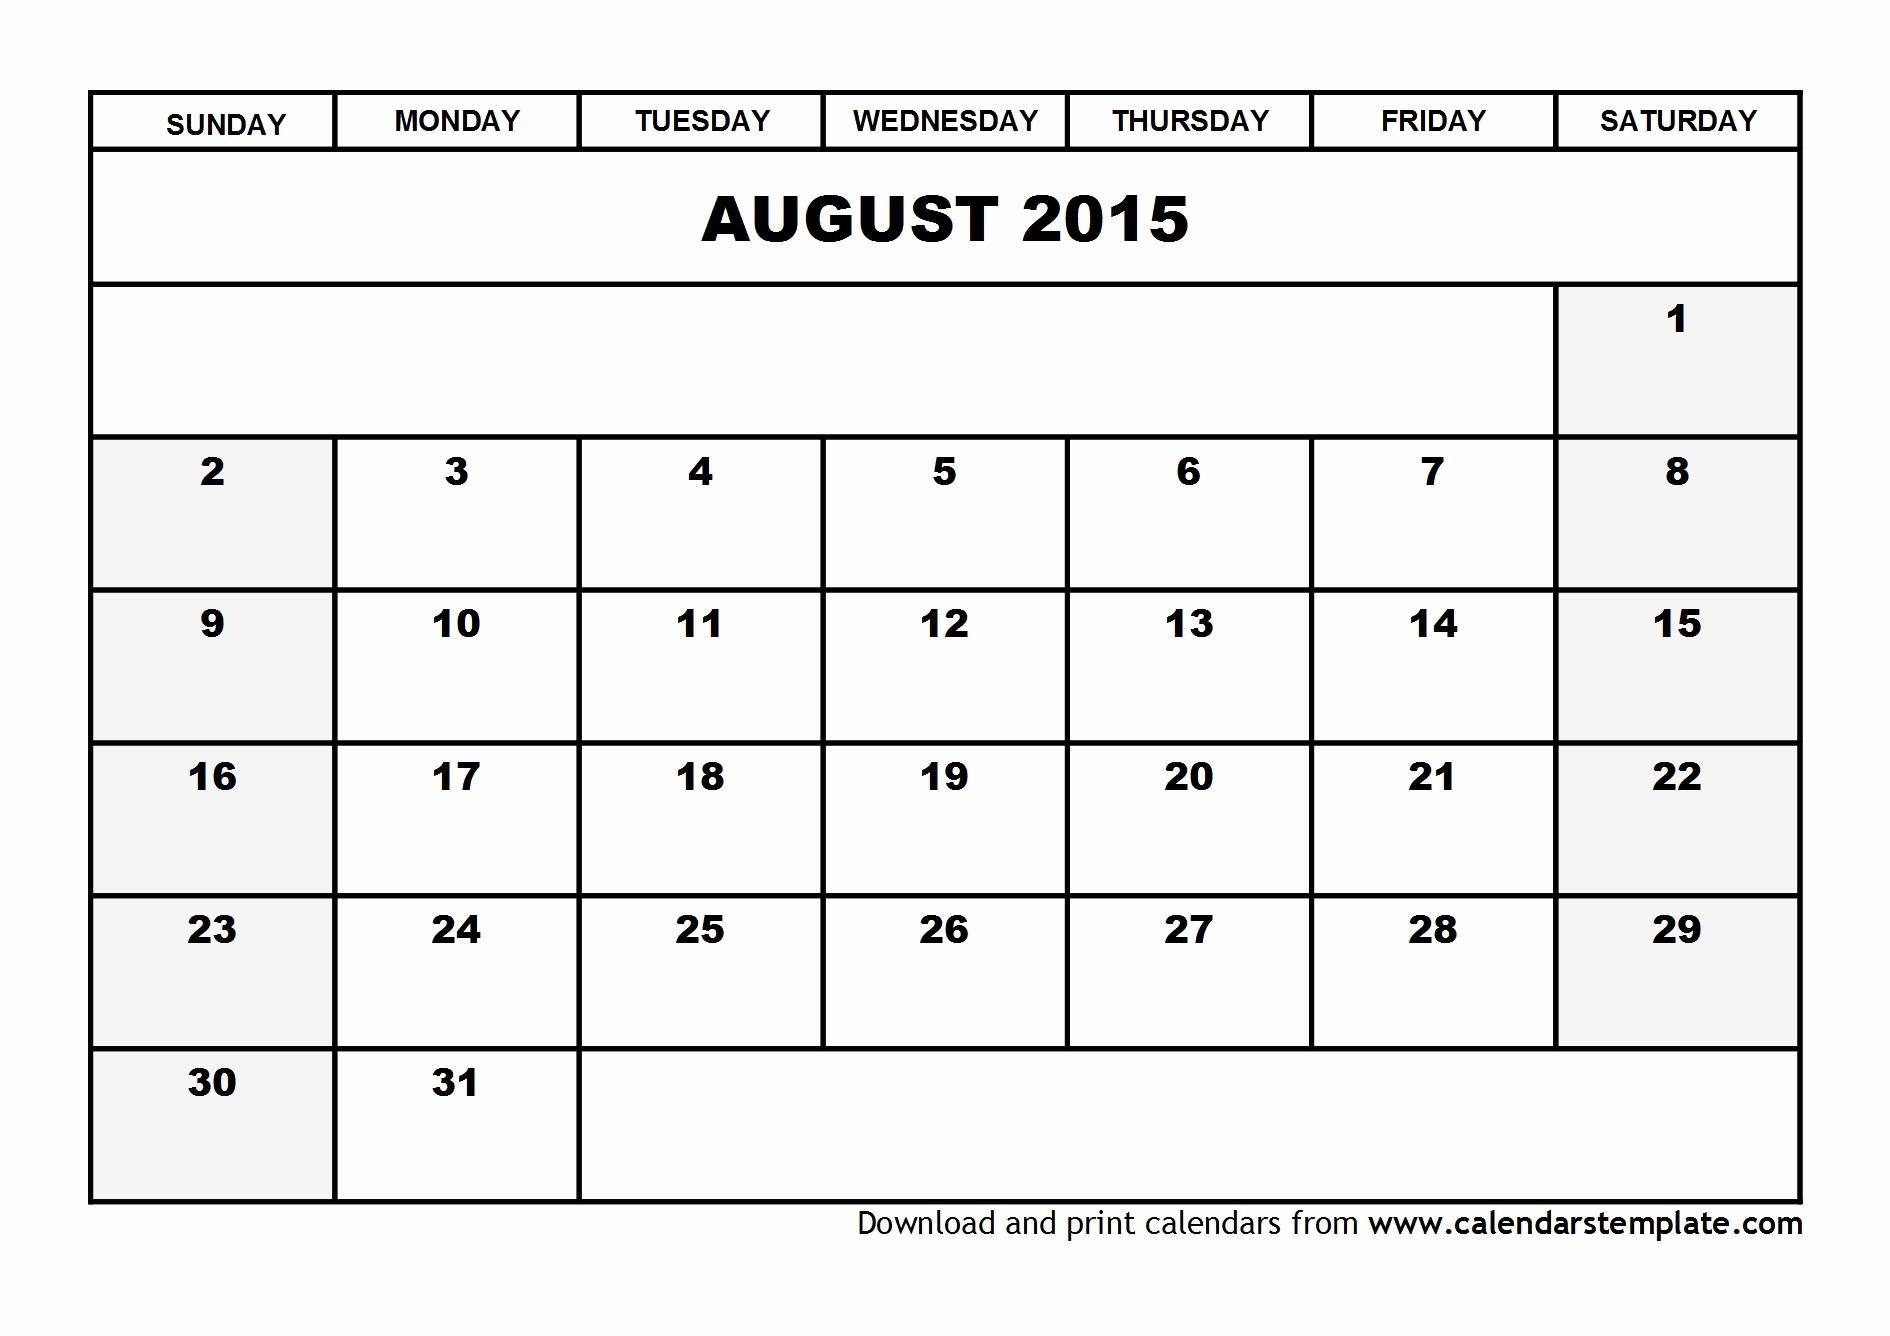 Free Calendar Templates August 2015 Unique August 2015 Calendar Template